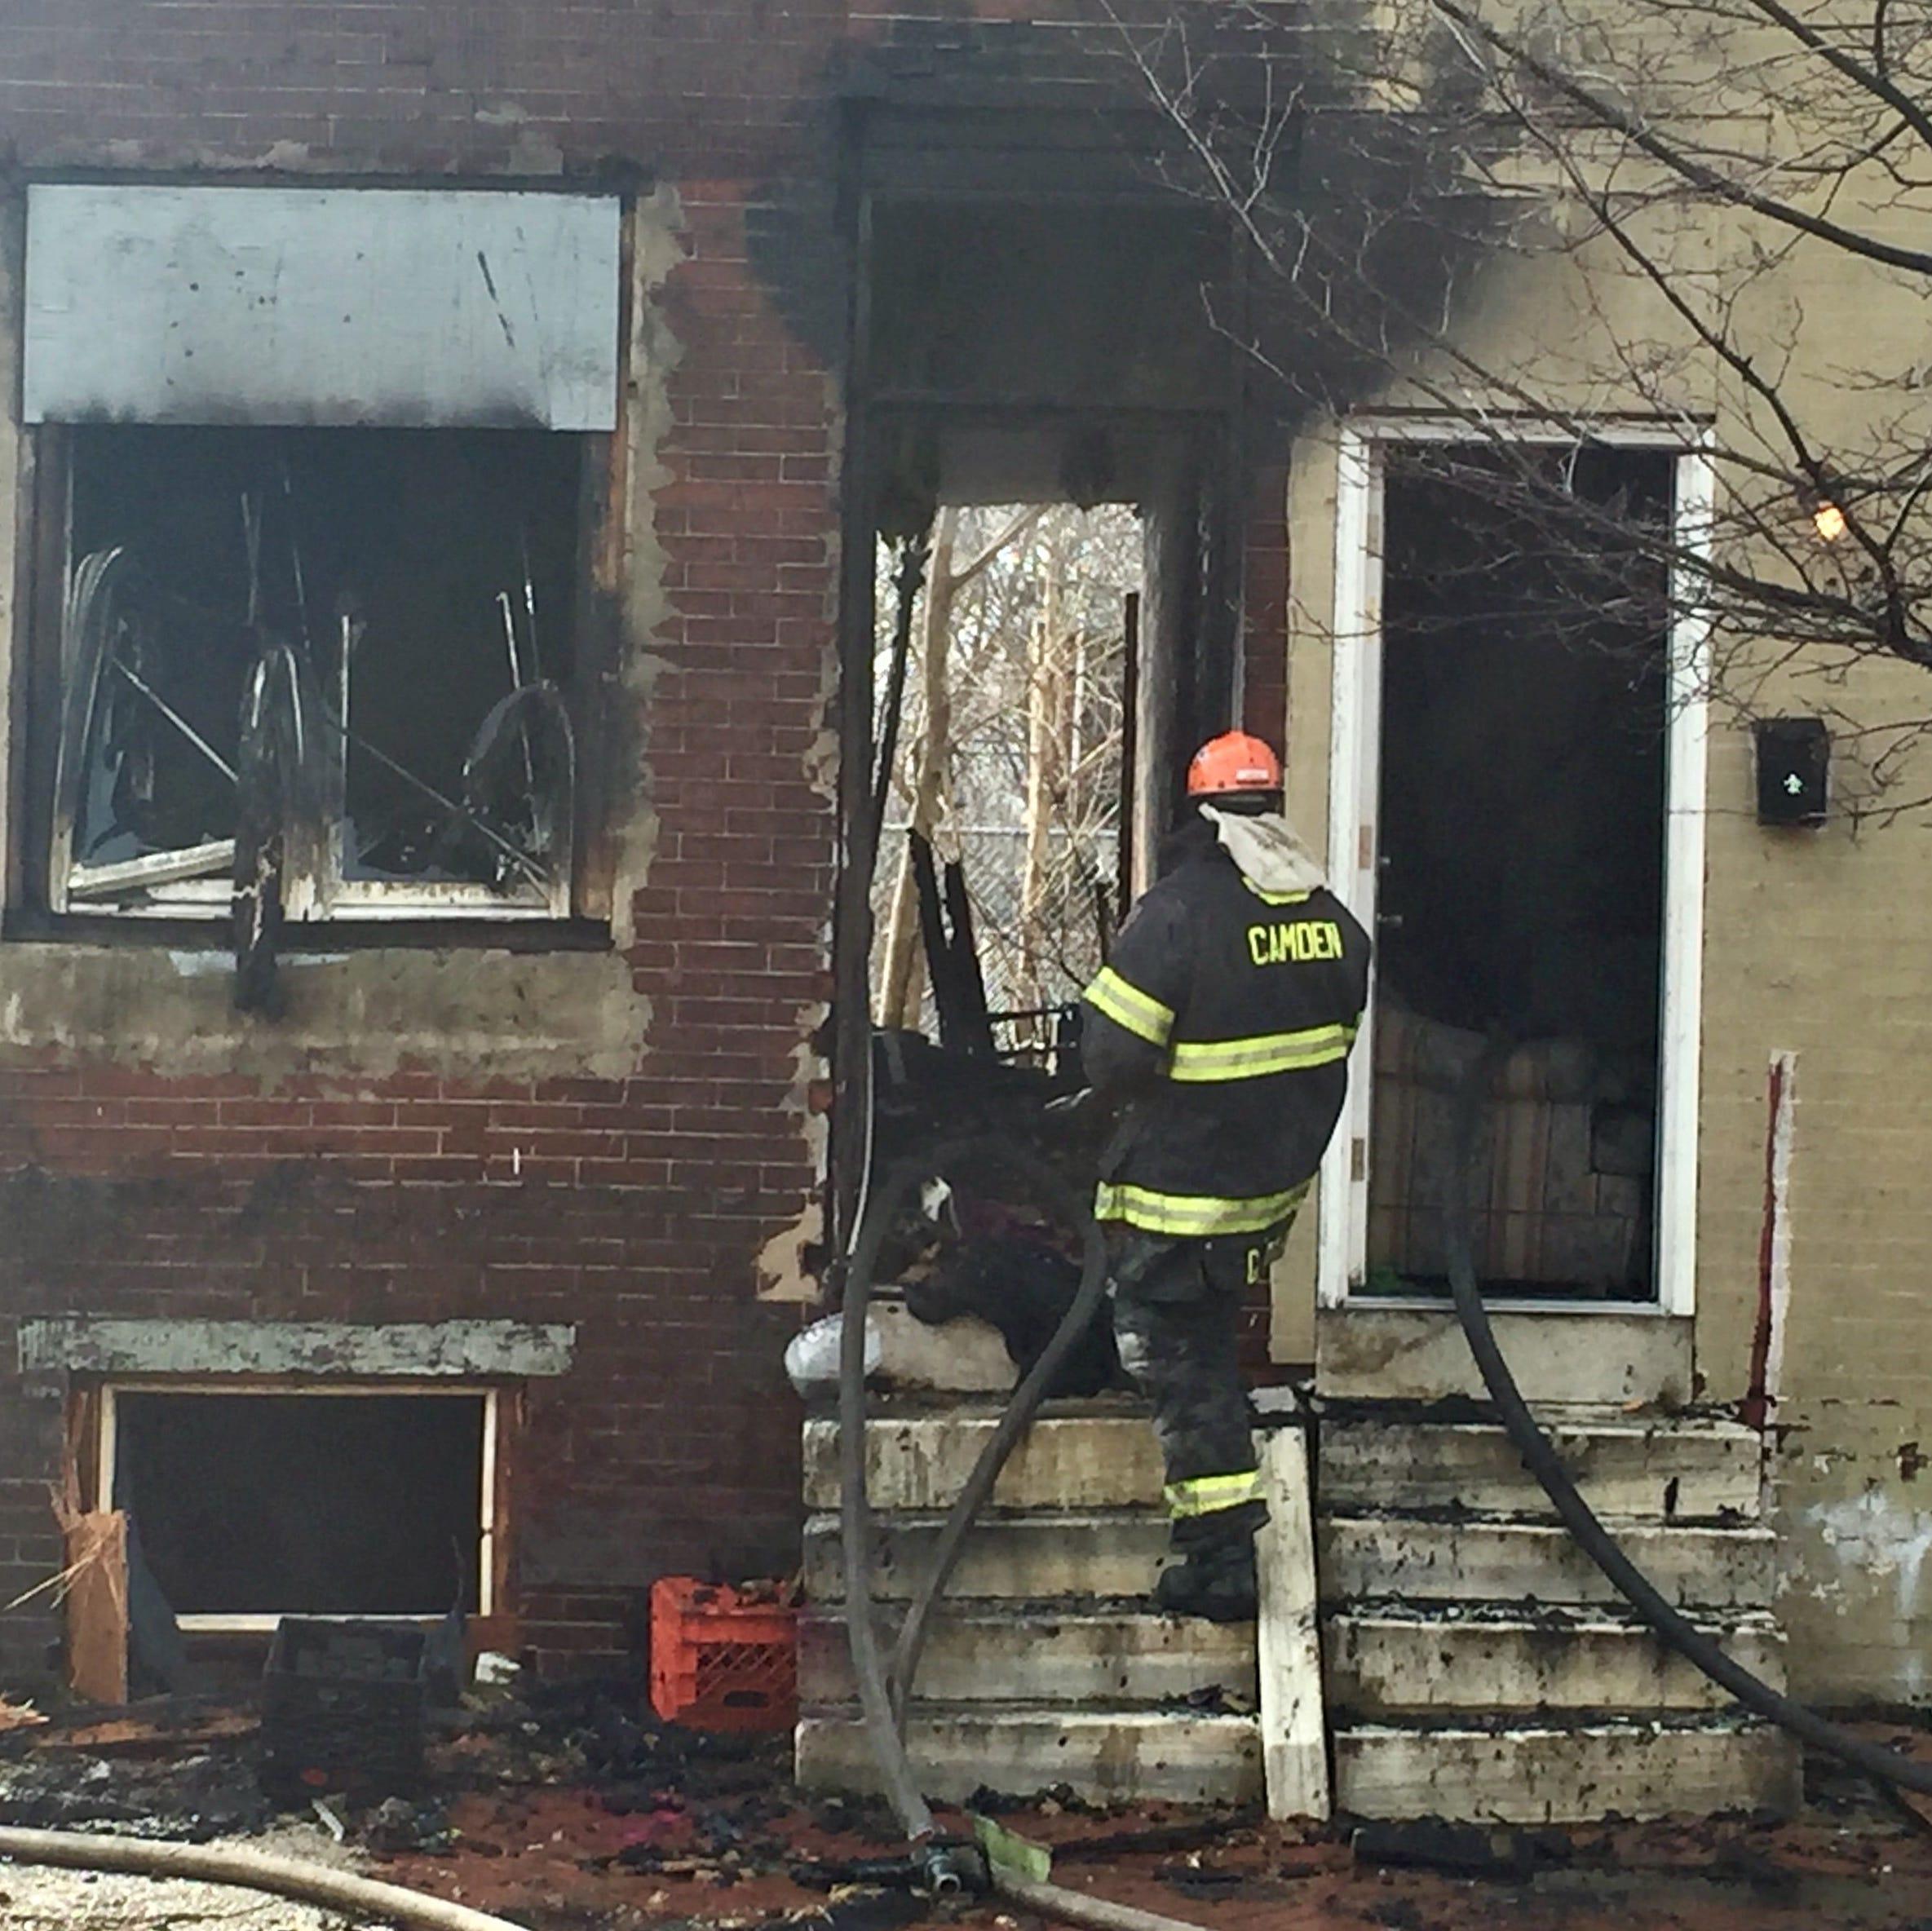 Fires strike homes in Camden, Gloucester Township